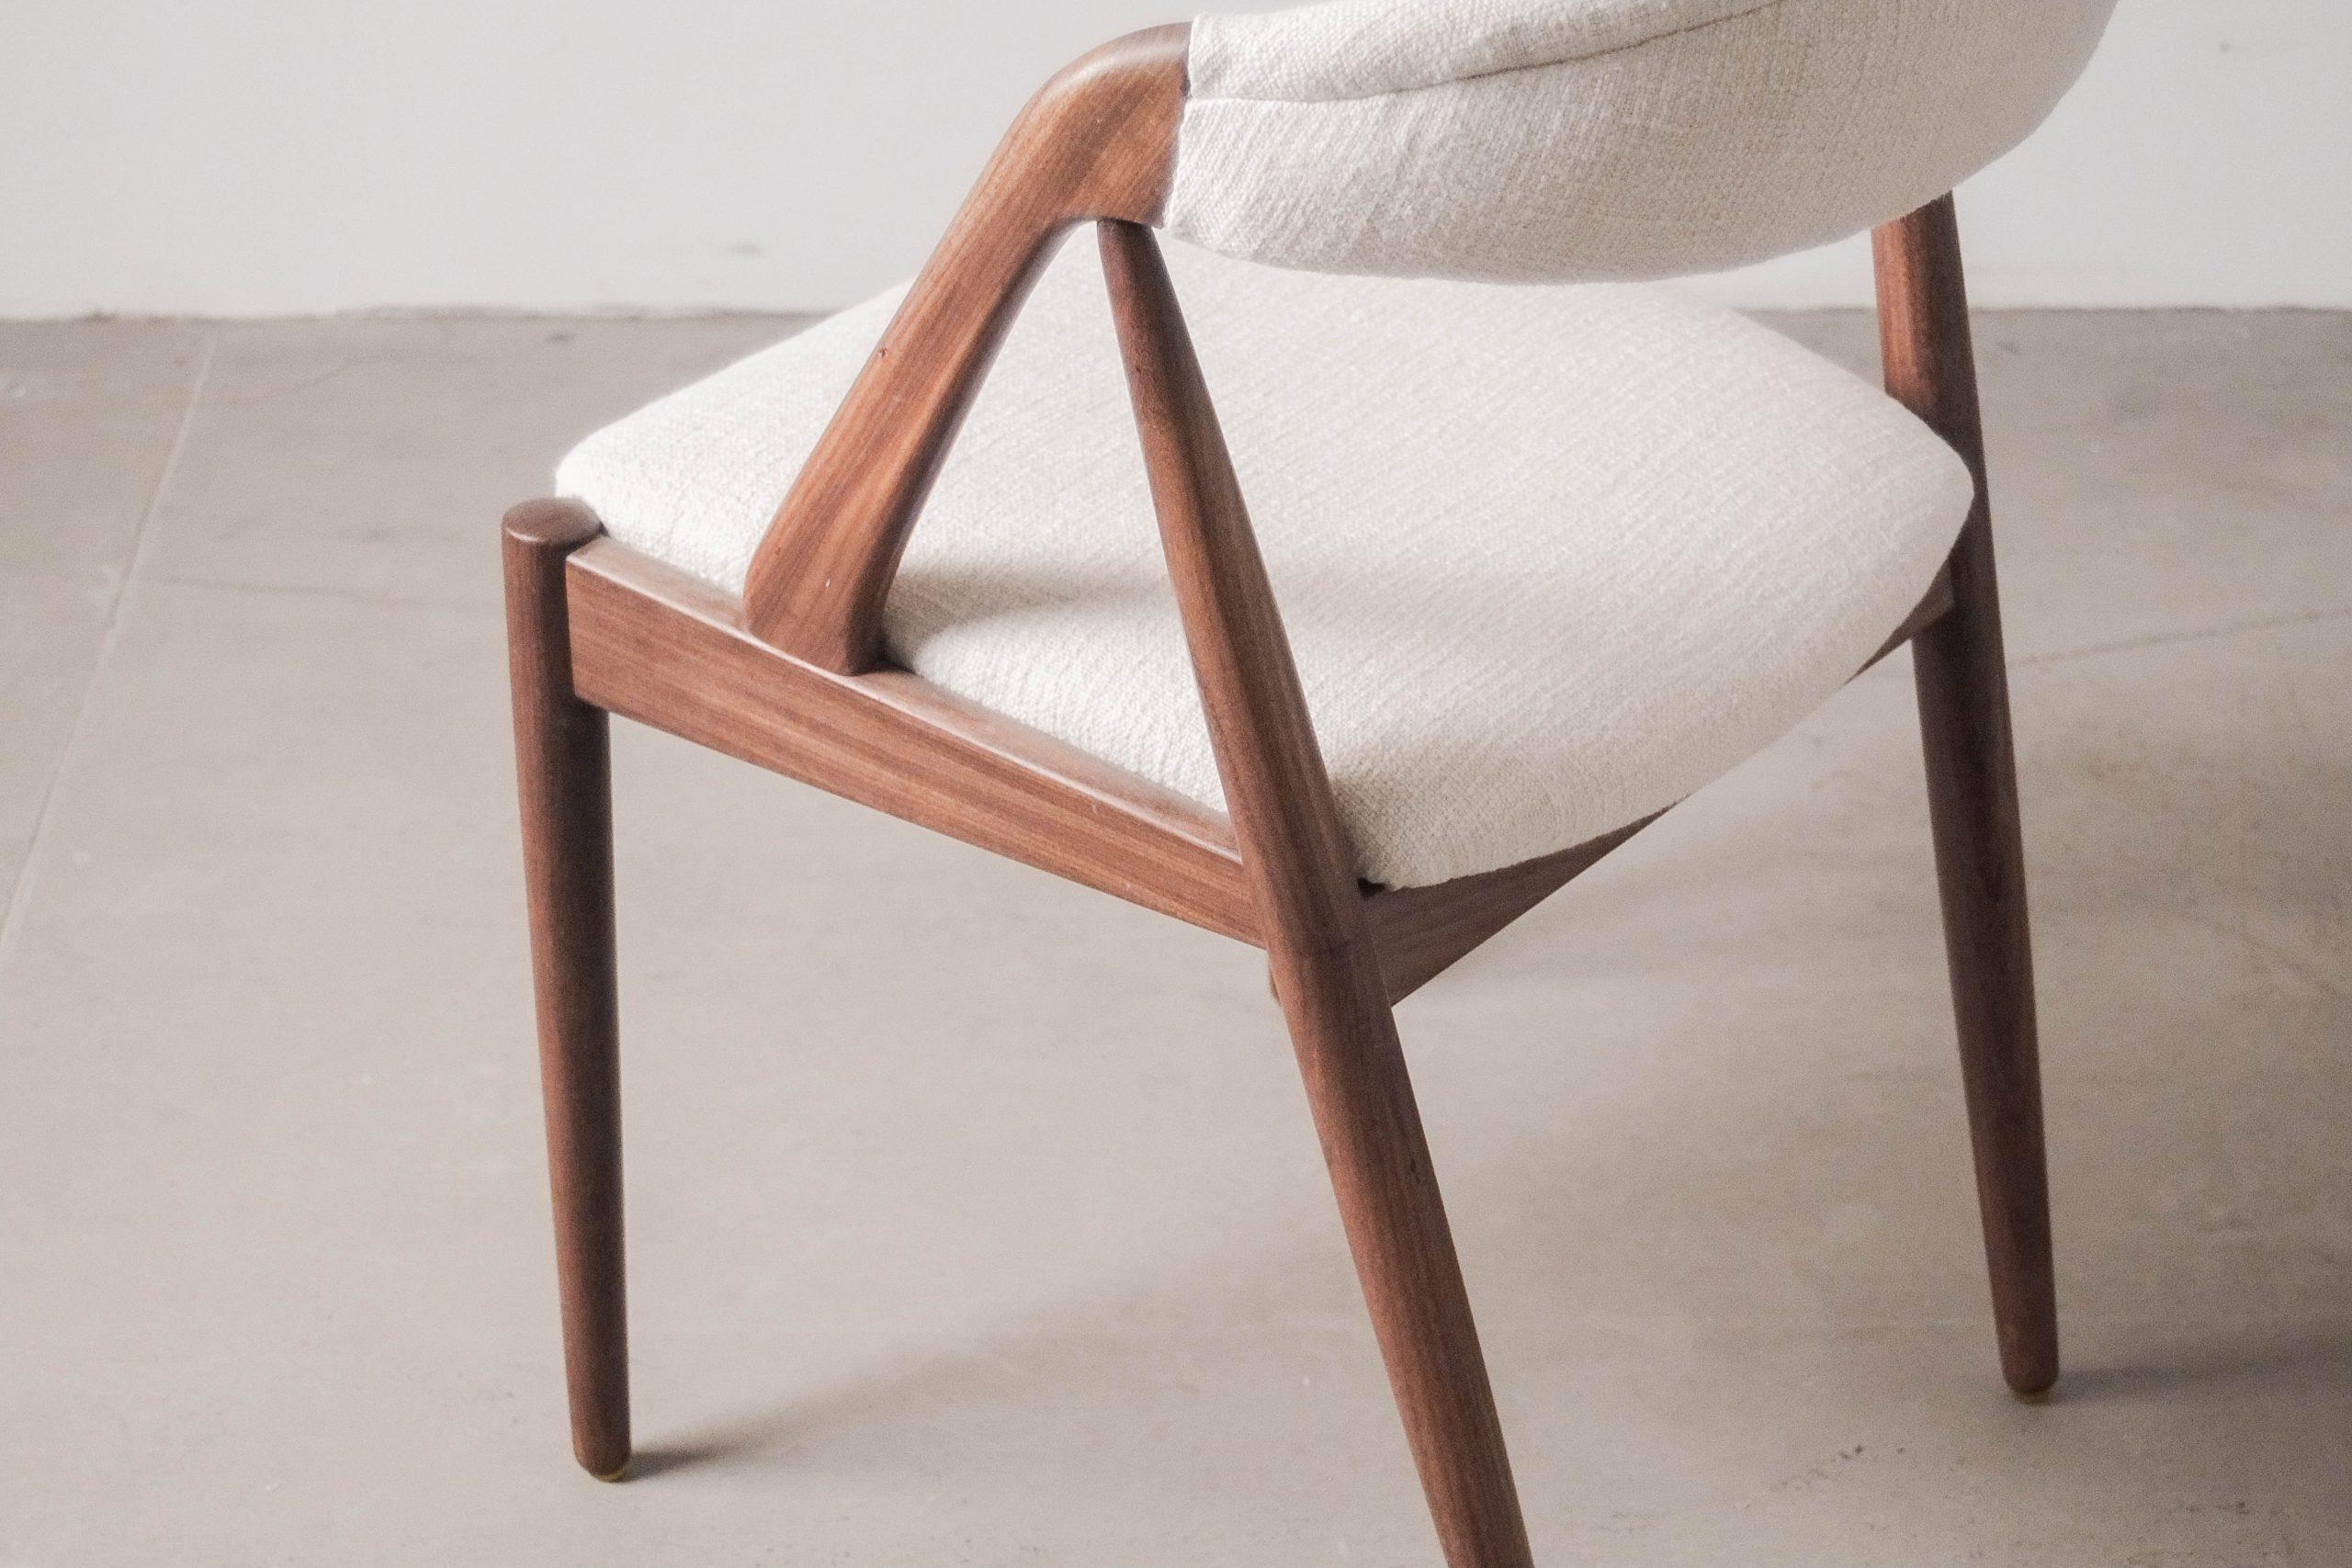 silla kai kristiansen de comedor de salon diseño vintage calidad tapizada lino